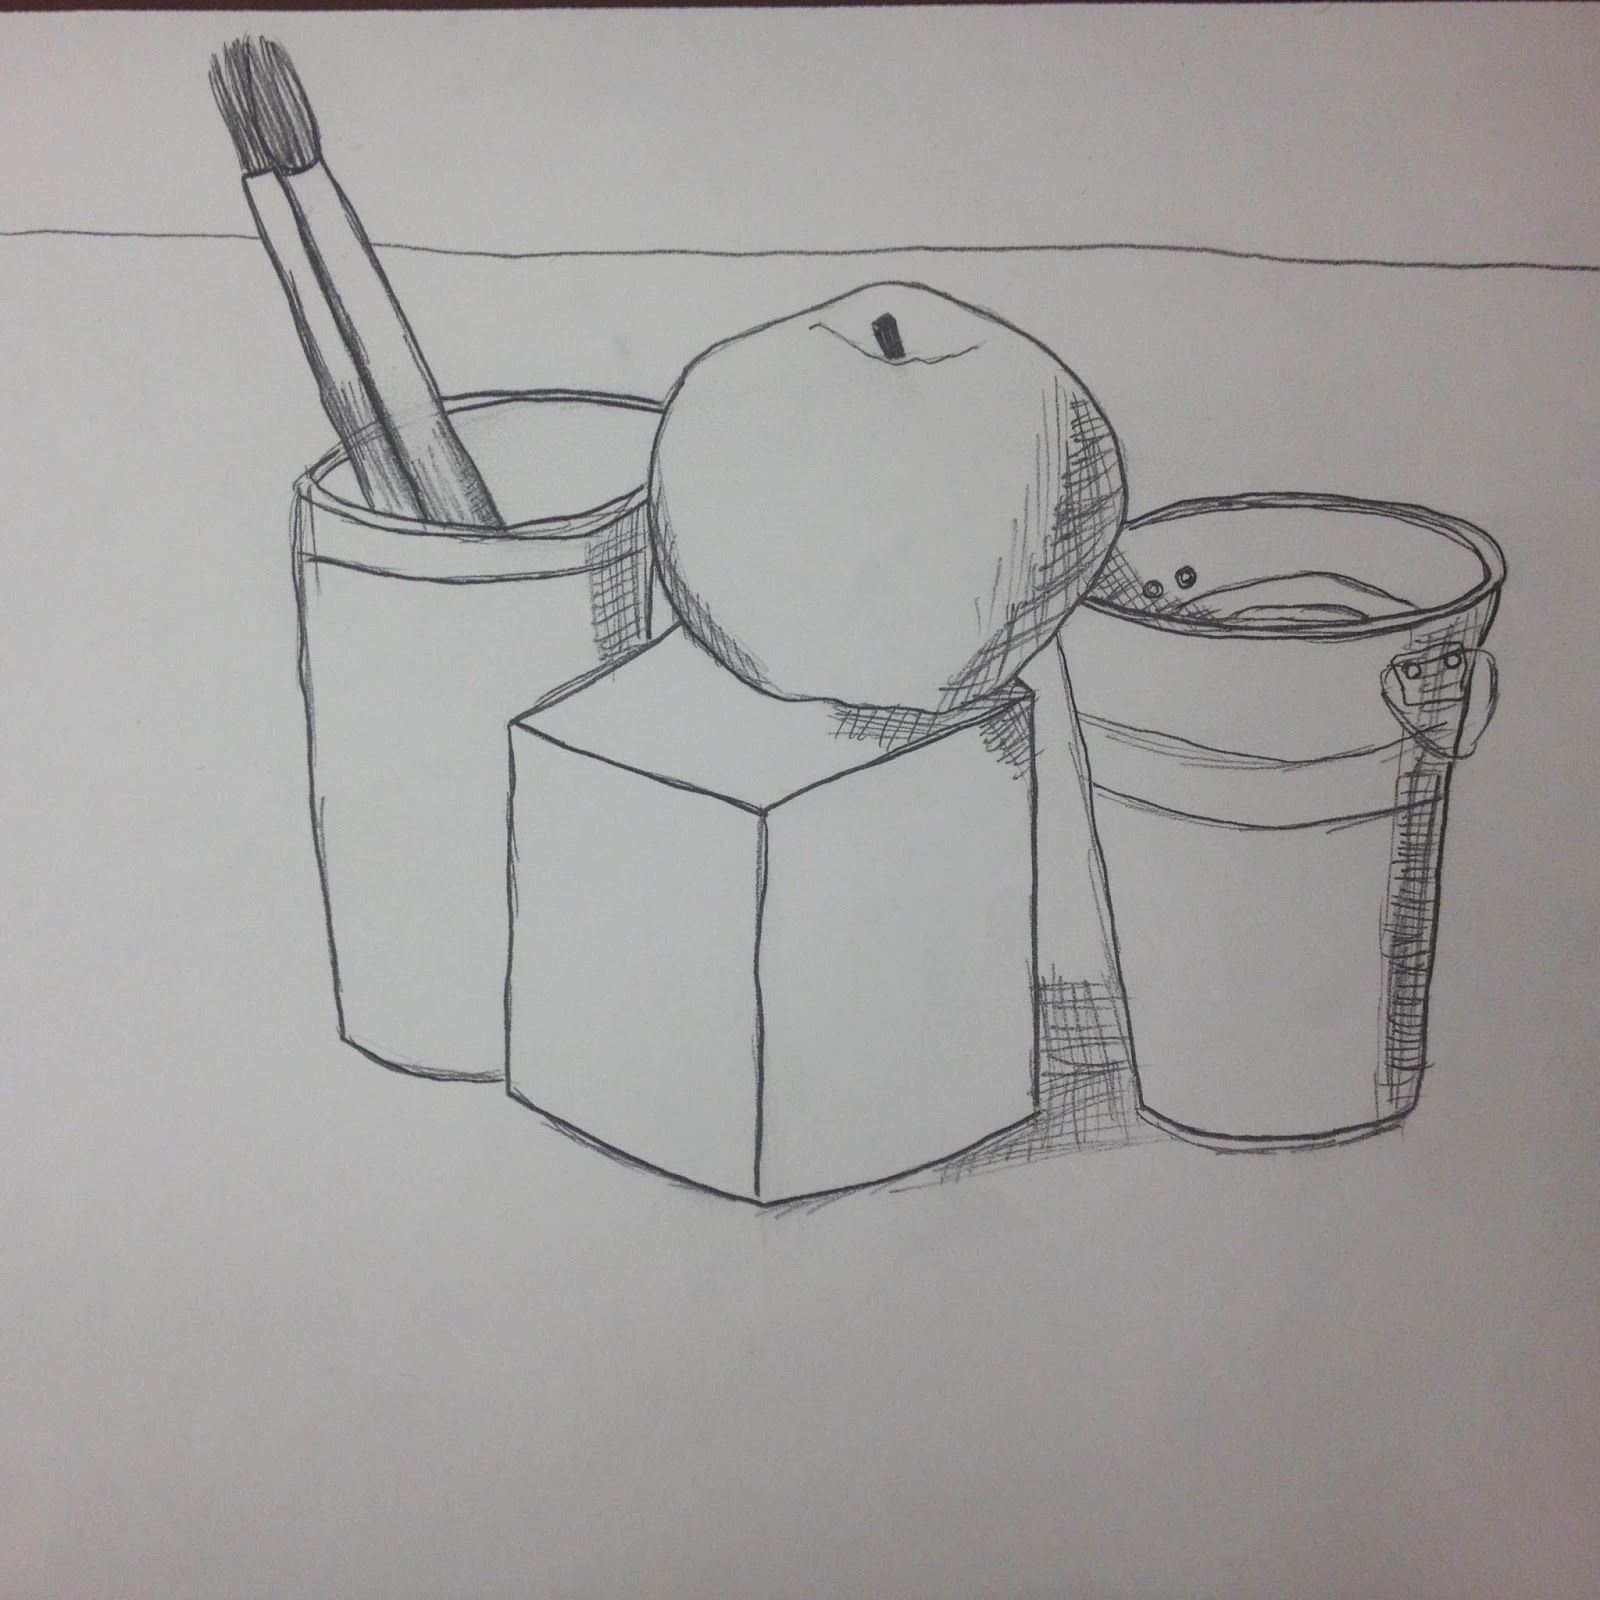 Little Dog Art Blog Art Lessons Middle School Middle School Art Projects 6th Grade Art